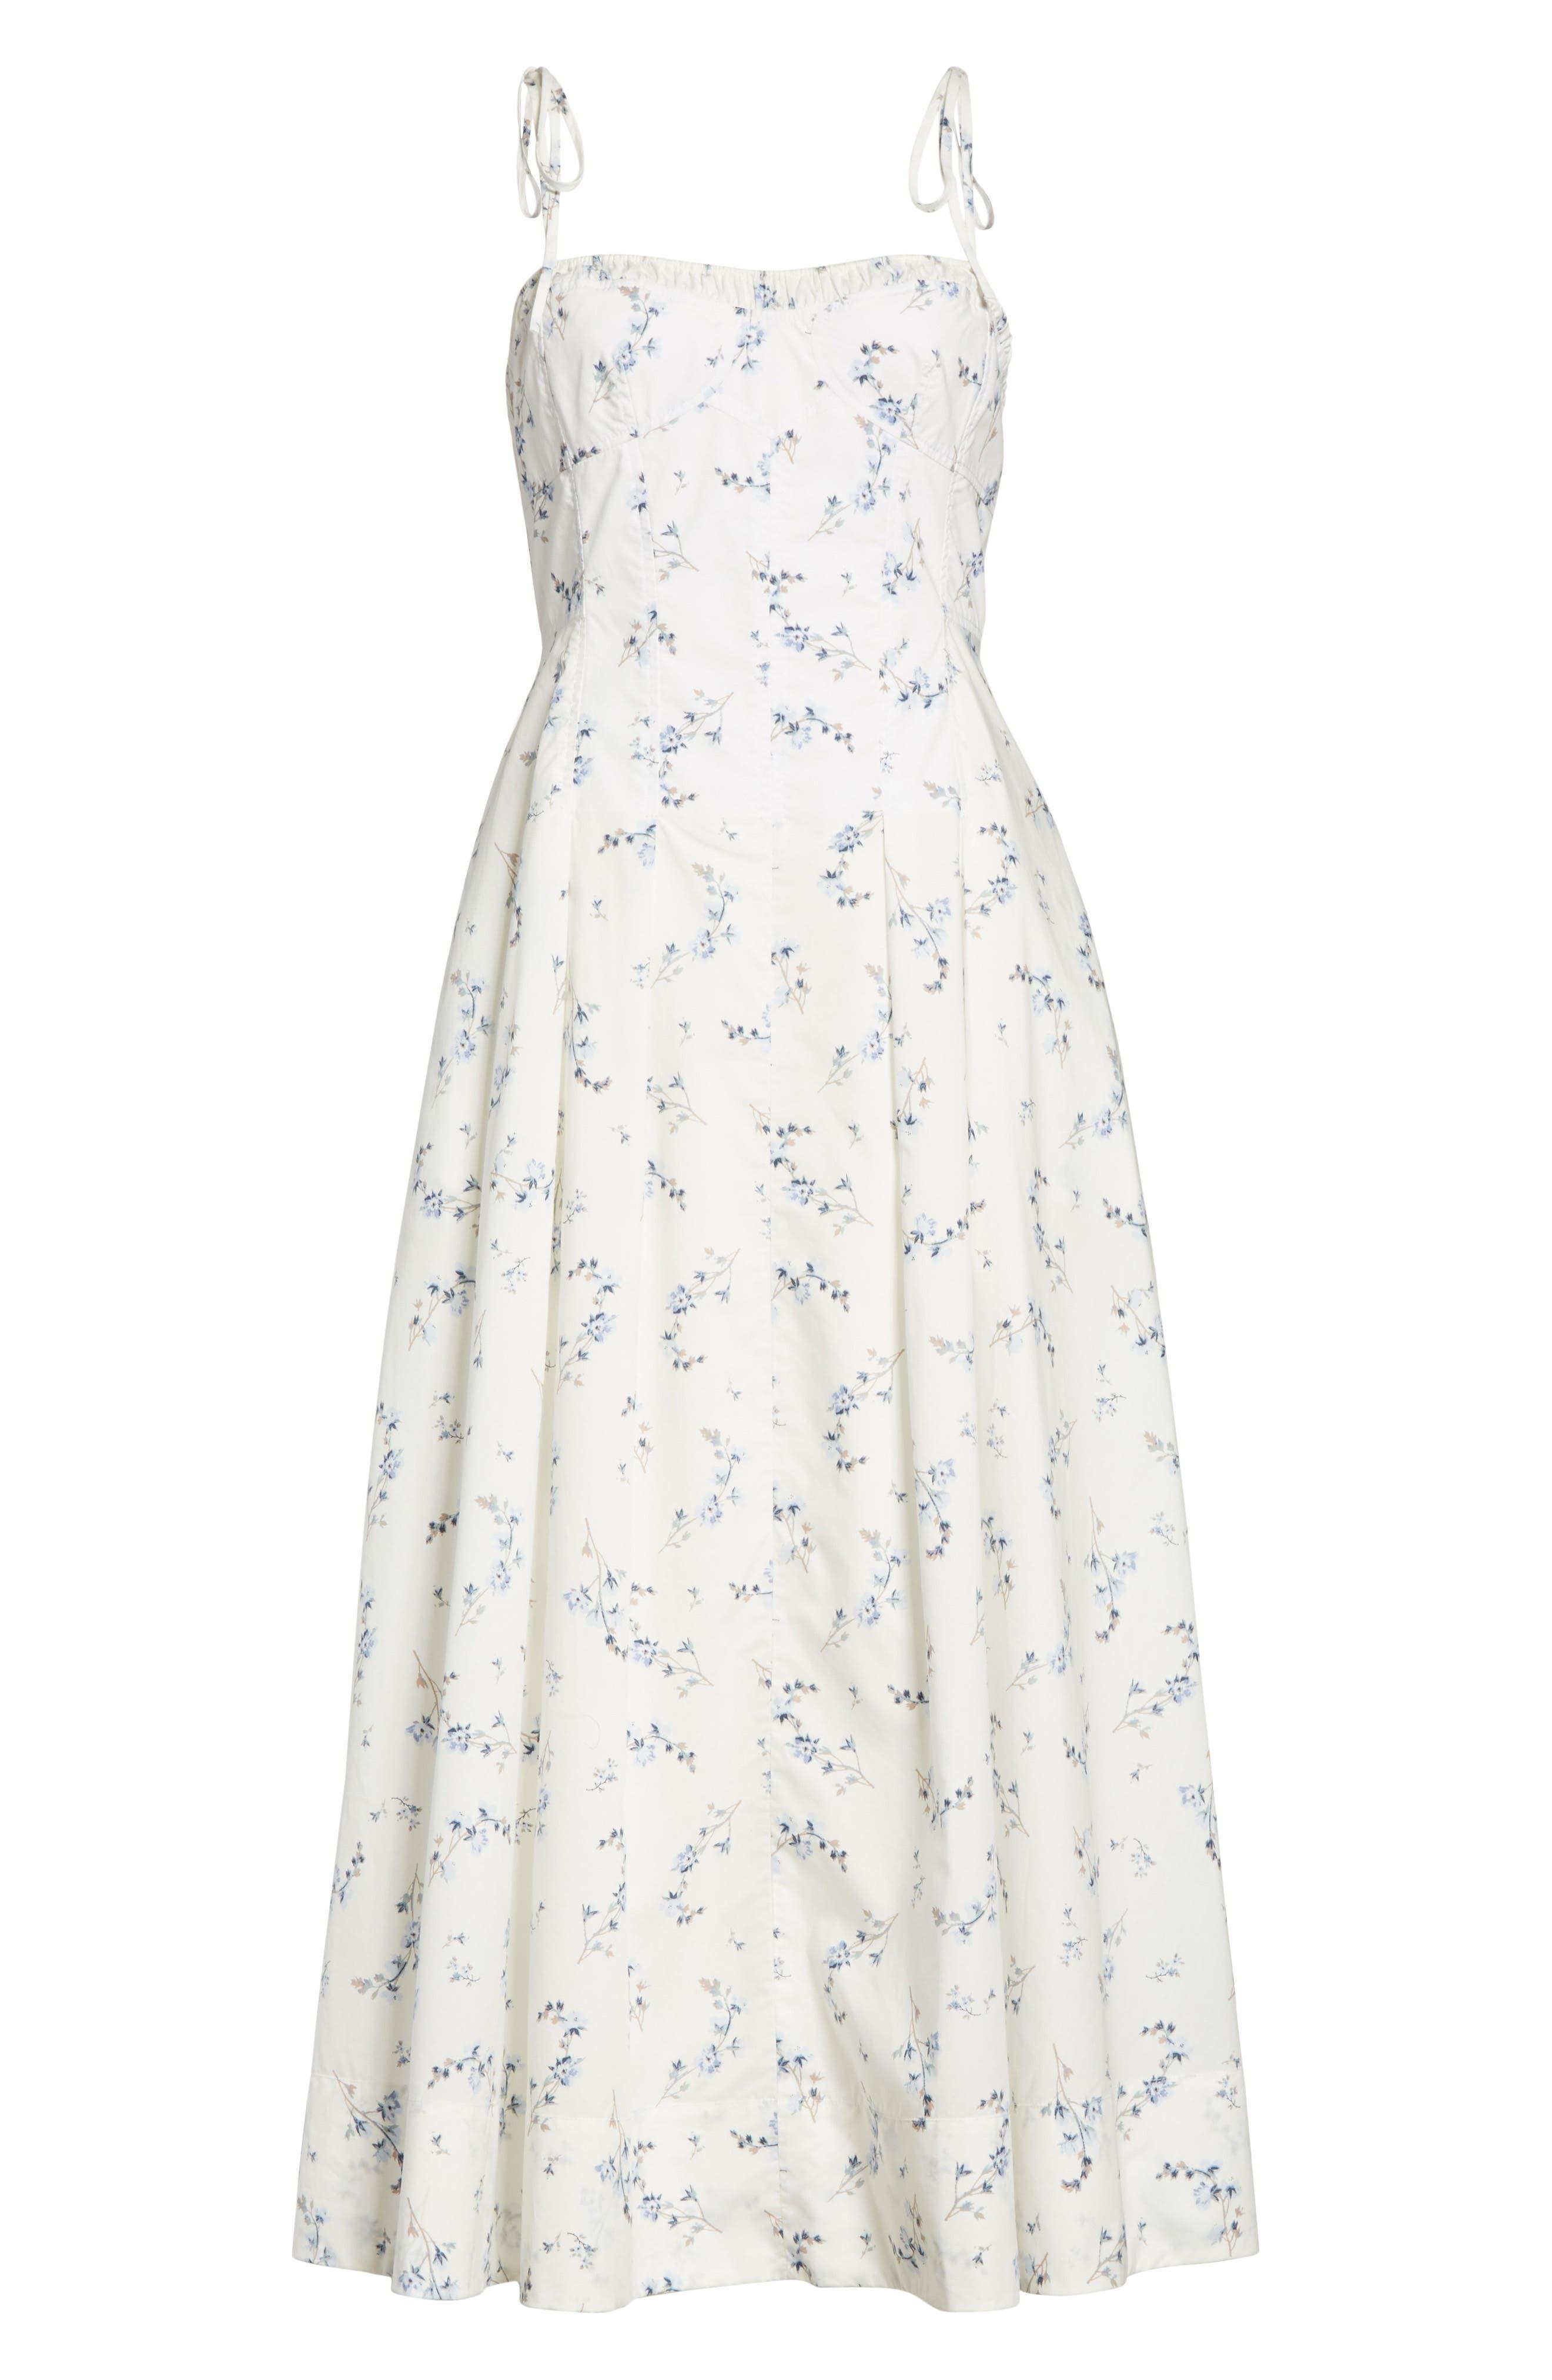 Francine Floral Cotton Poplin Dress,                             Alternate thumbnail 6, color,                             103